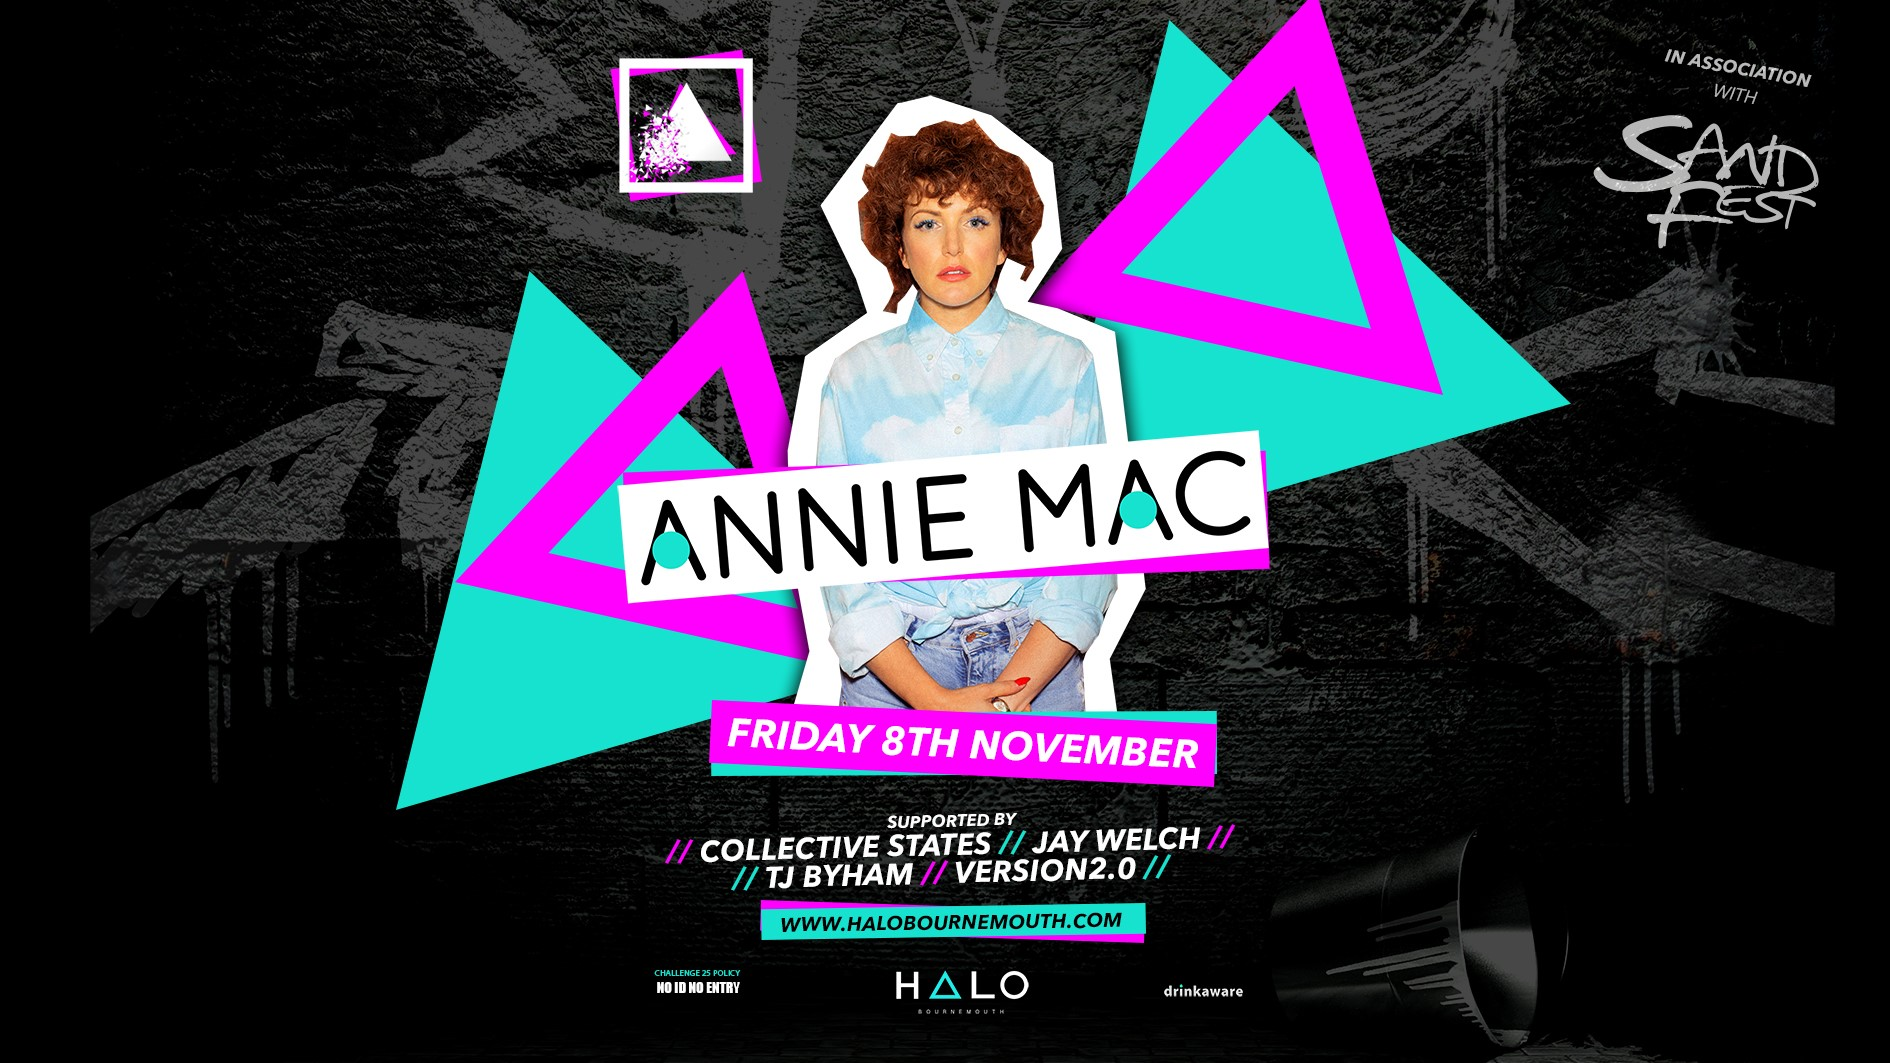 Halo sessions 19: Annie Mac (Radio 1)